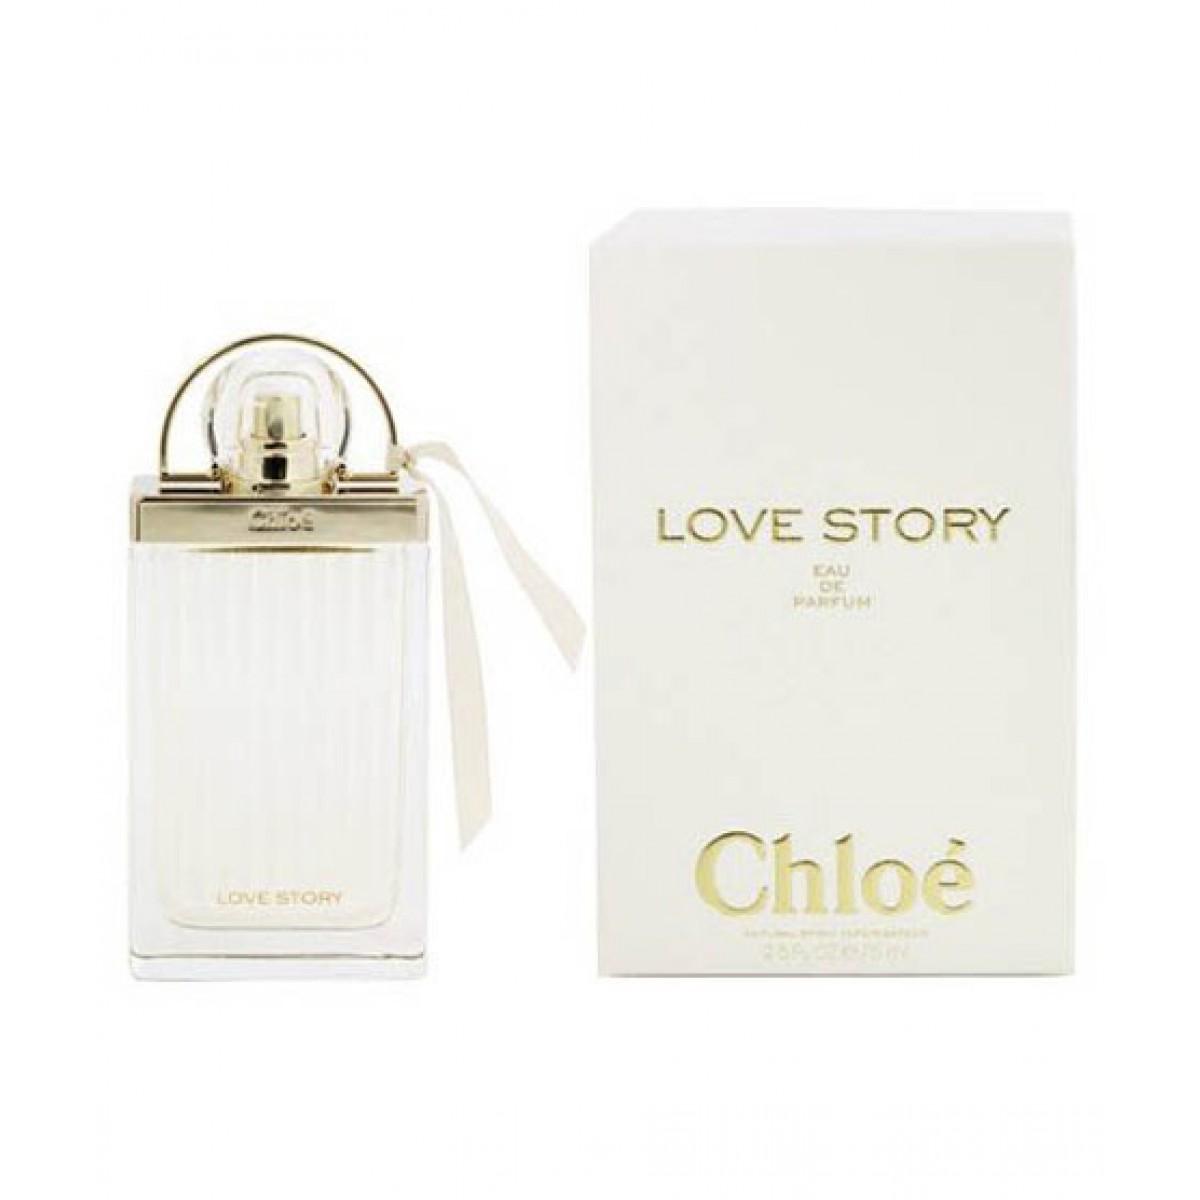 Chloe Love Story Eau De Parfum For Women 75ml